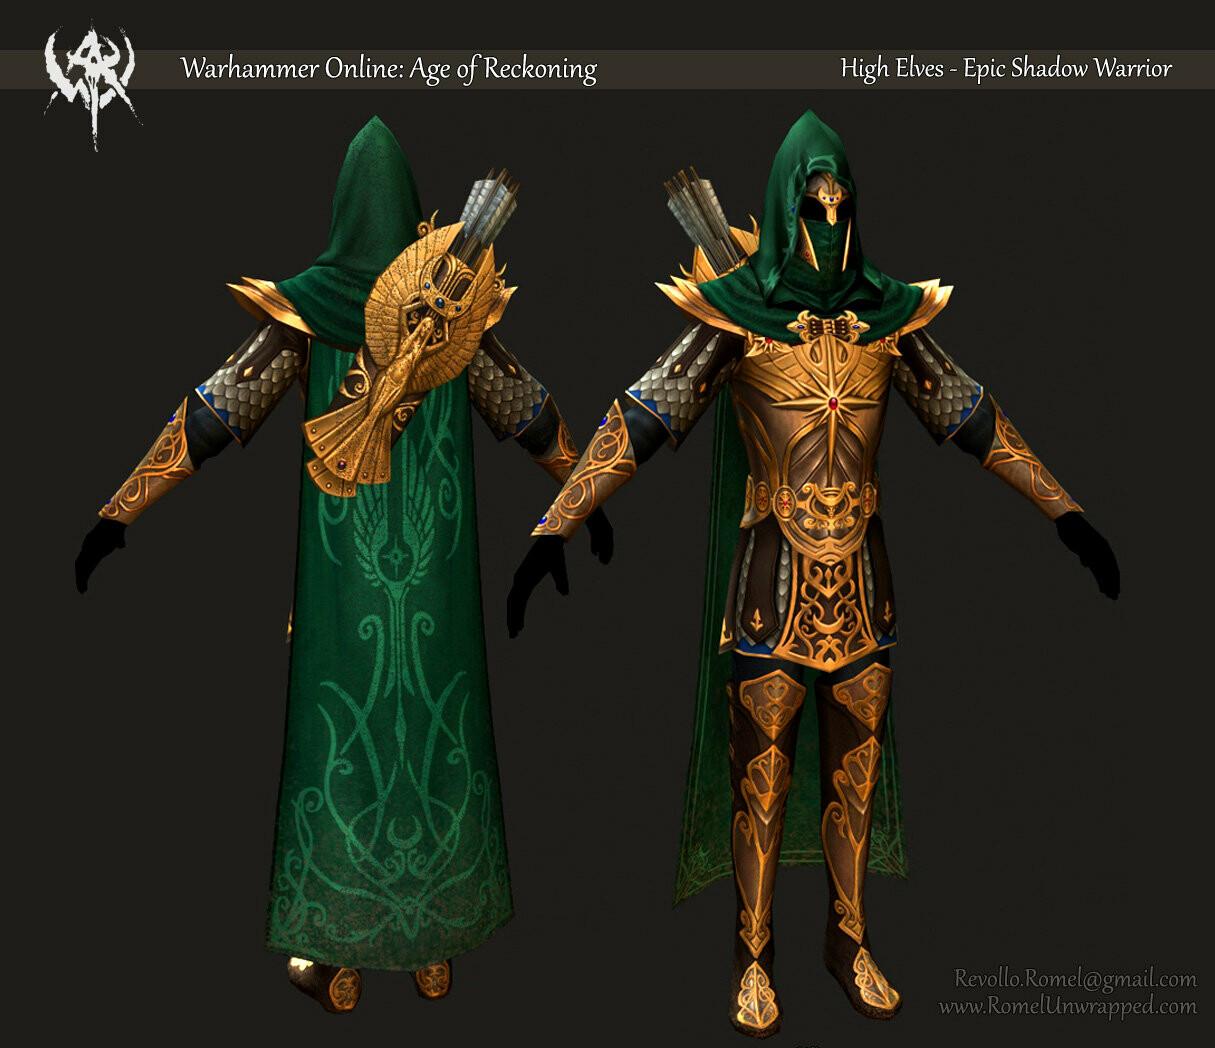 High Elves - Shadow Warrior Epic Gear Set